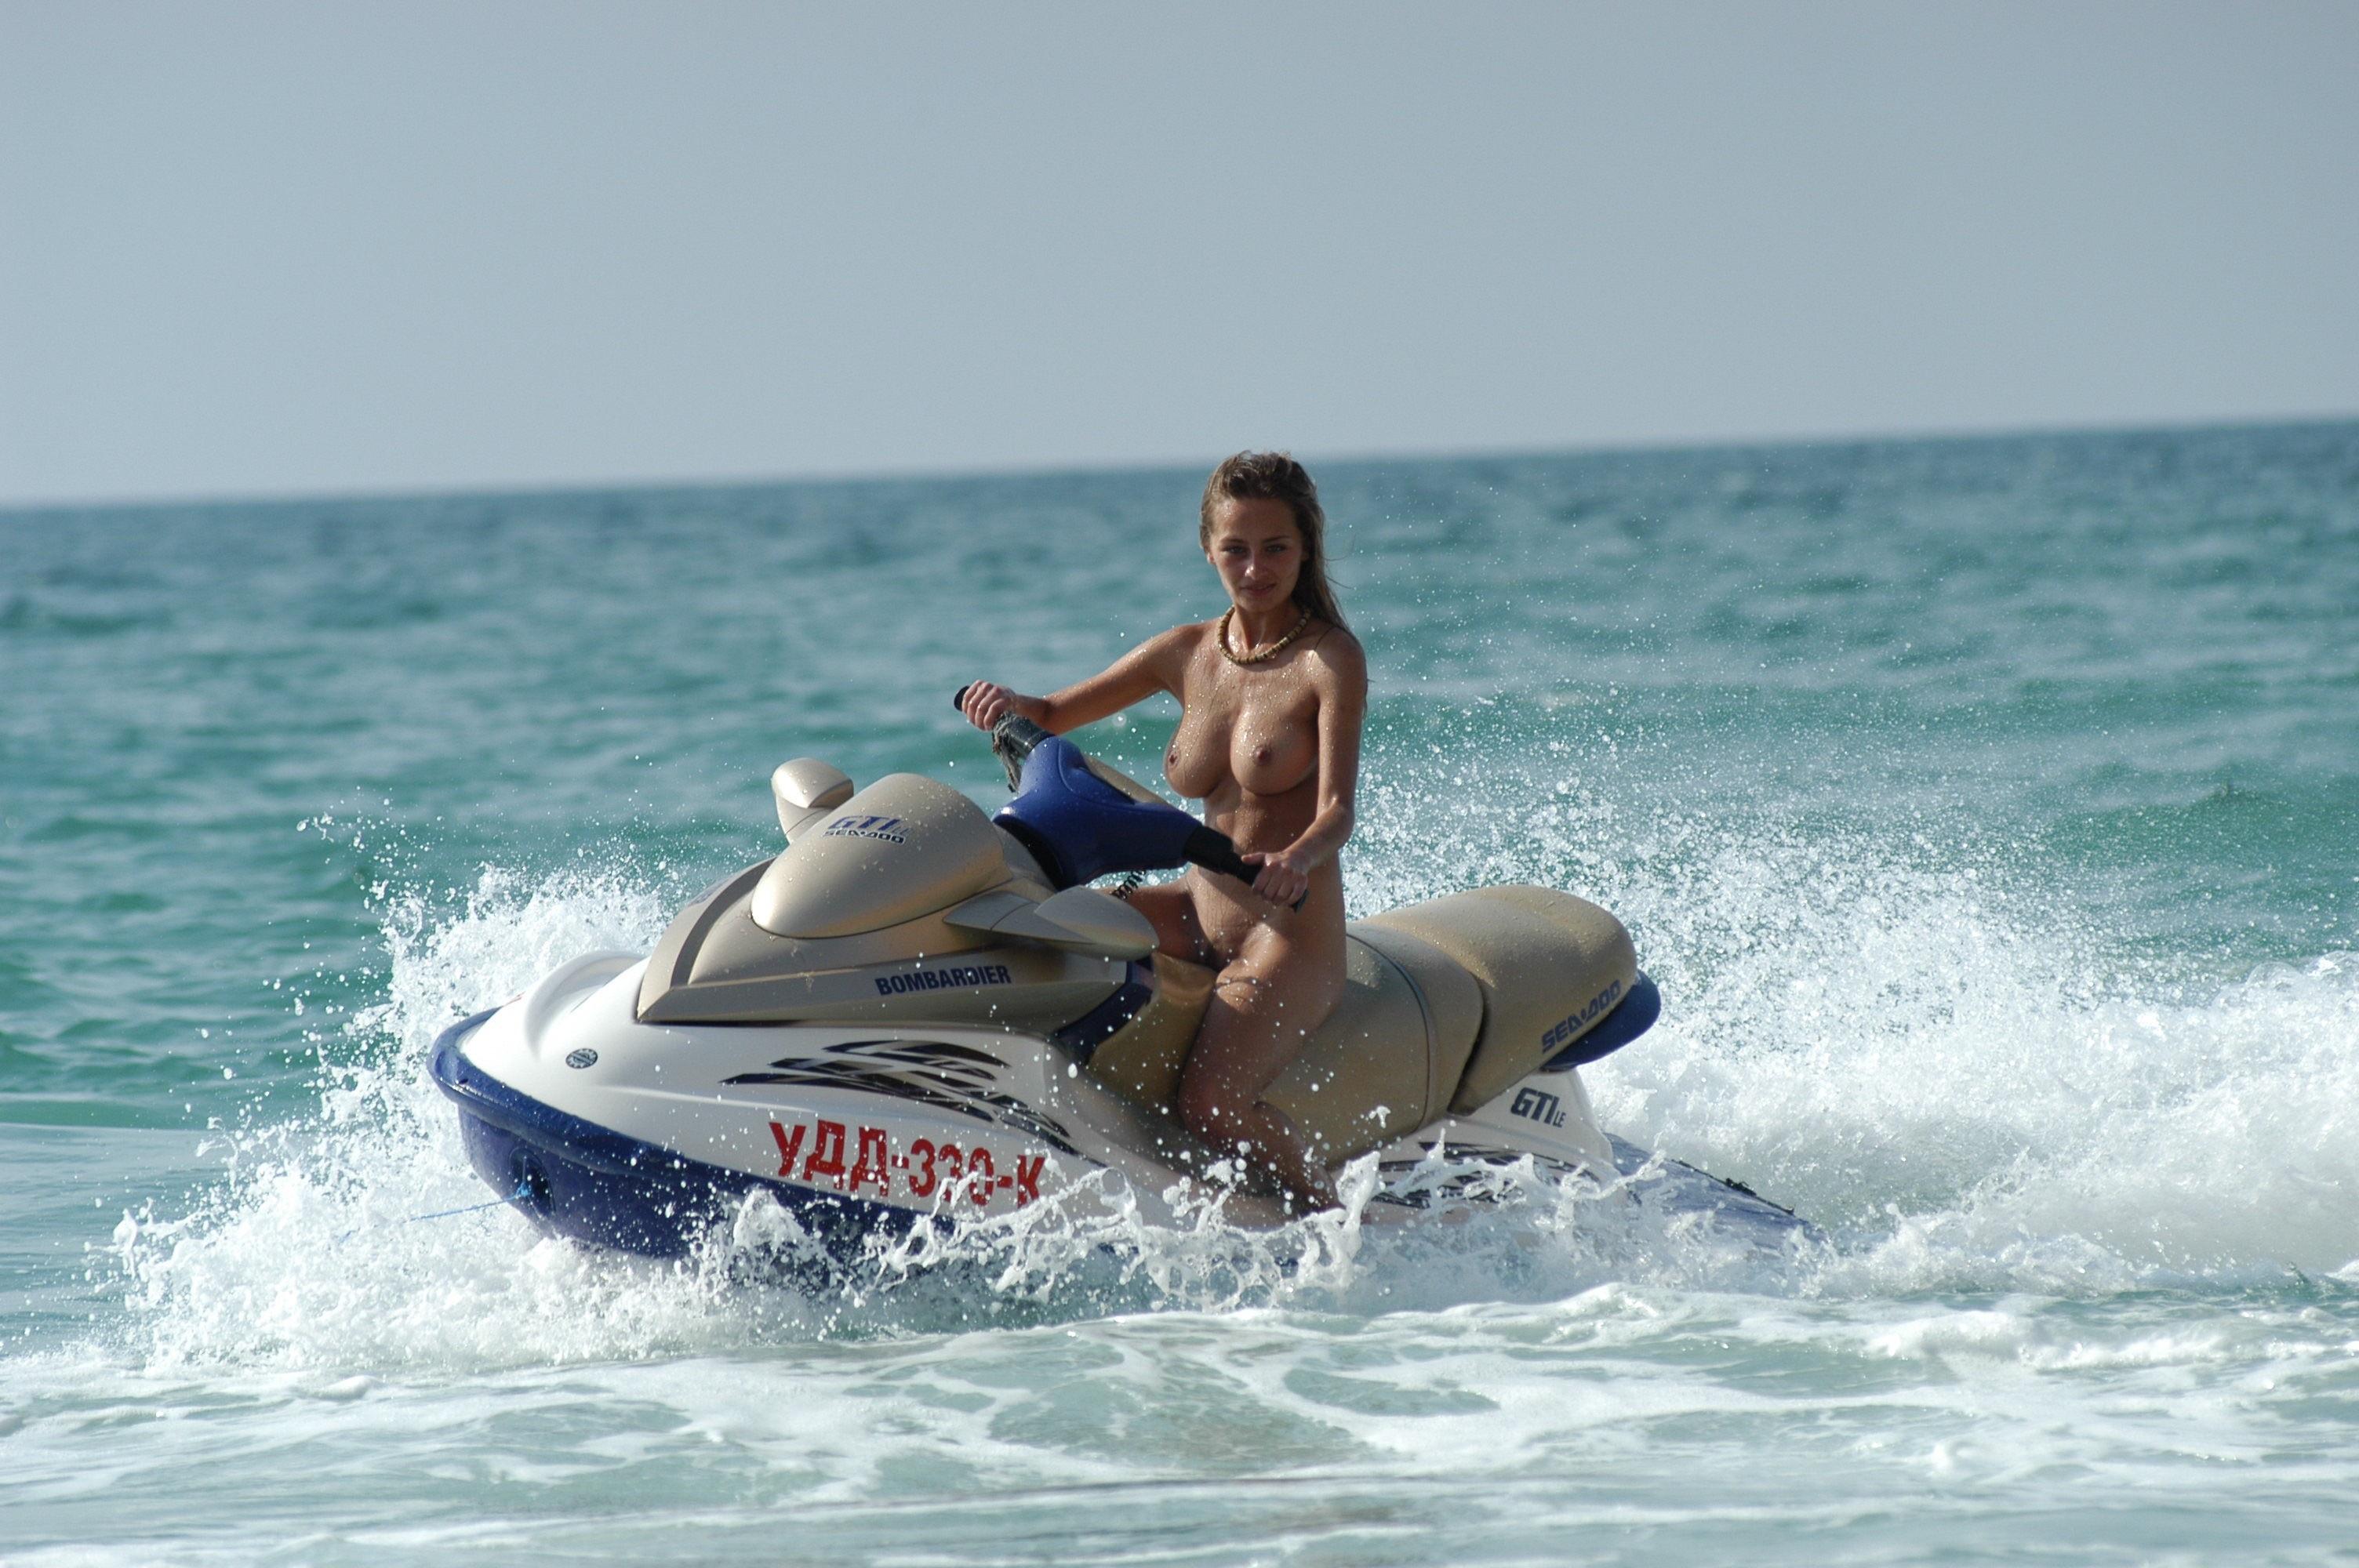 Nude girl jet skies